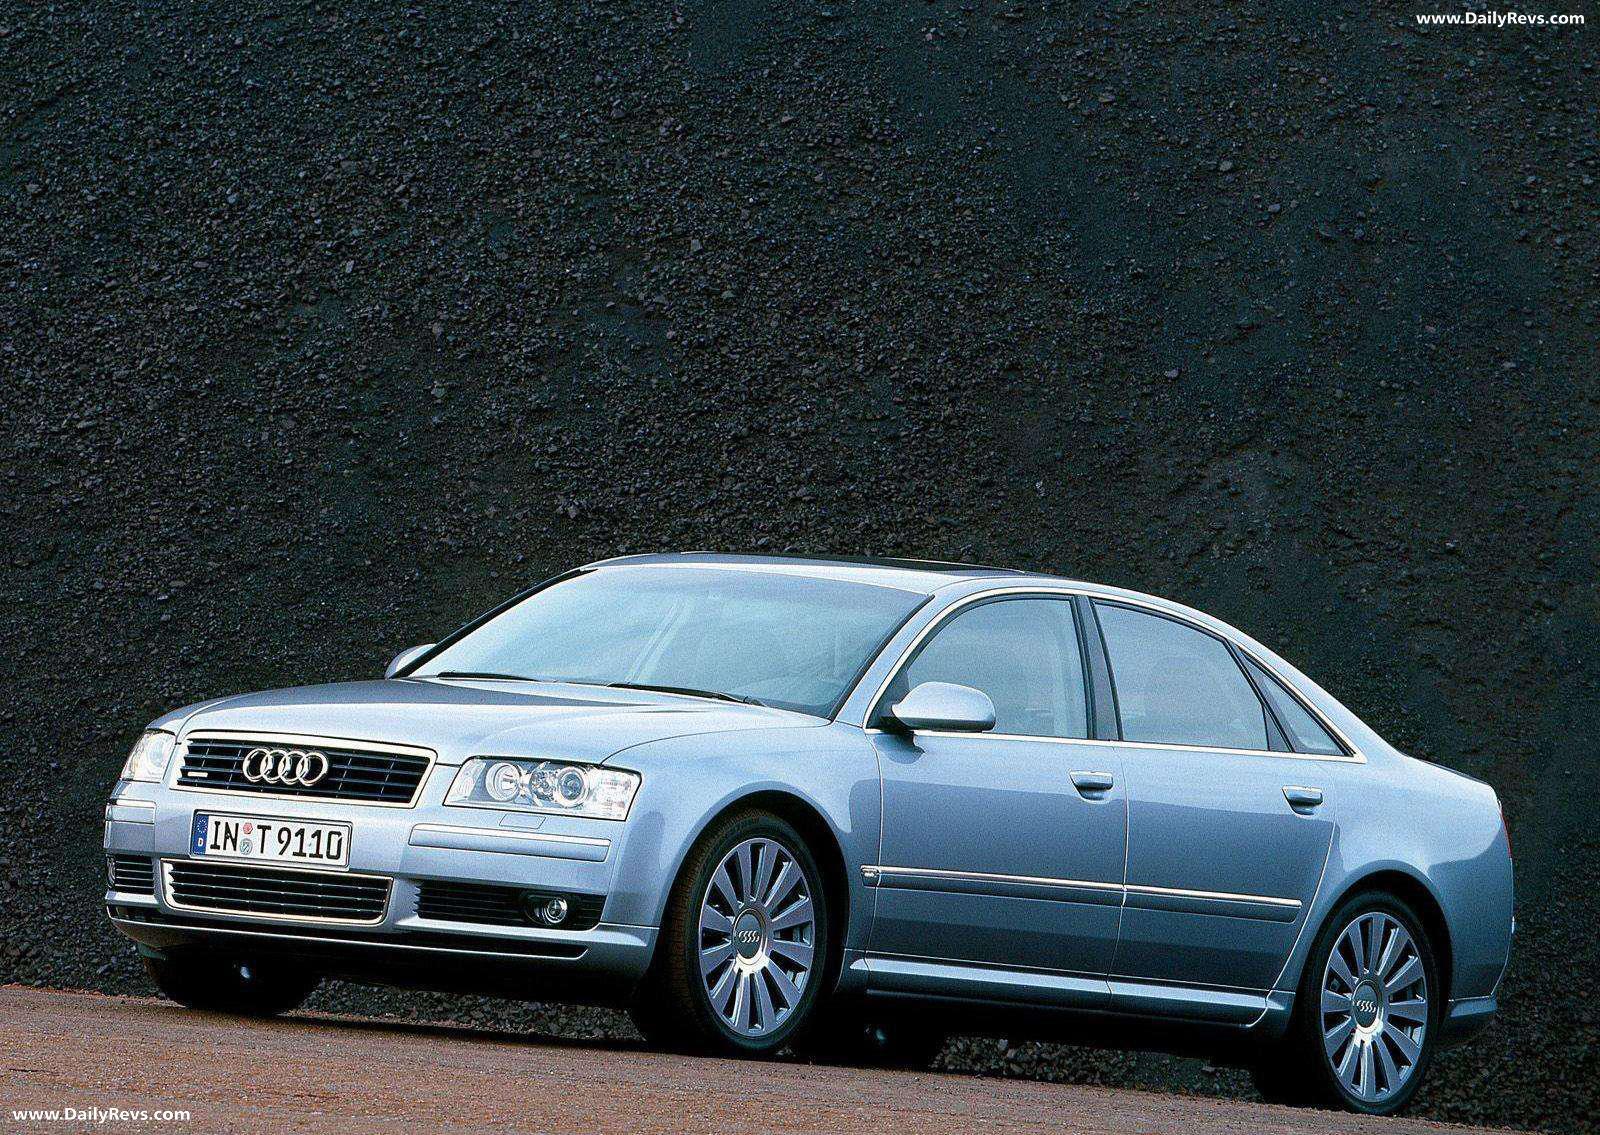 2004 Audi A8 4.2 quattro - HD Pictures, Videos, Specs & Informations - Dailyrevs